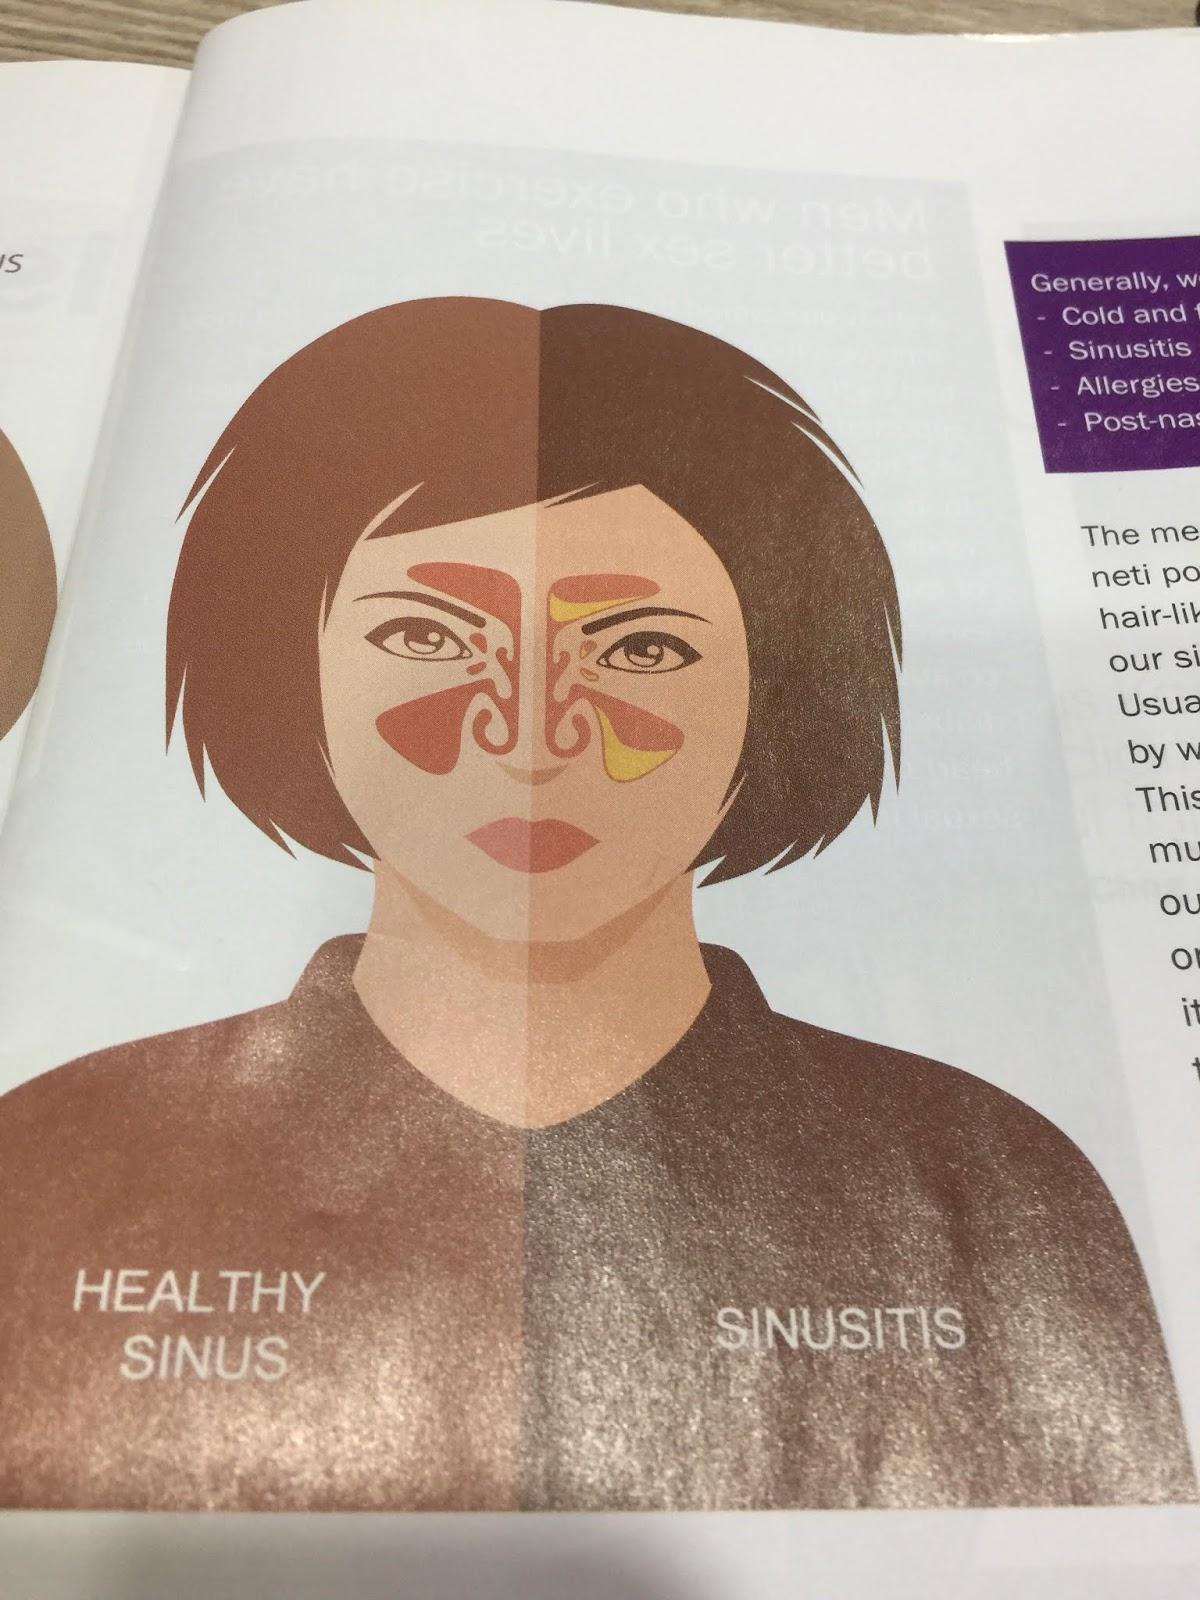 bahaya sinusitis, sakit kepala, pencegahan sinusitis, akibat penyakit sinusitis